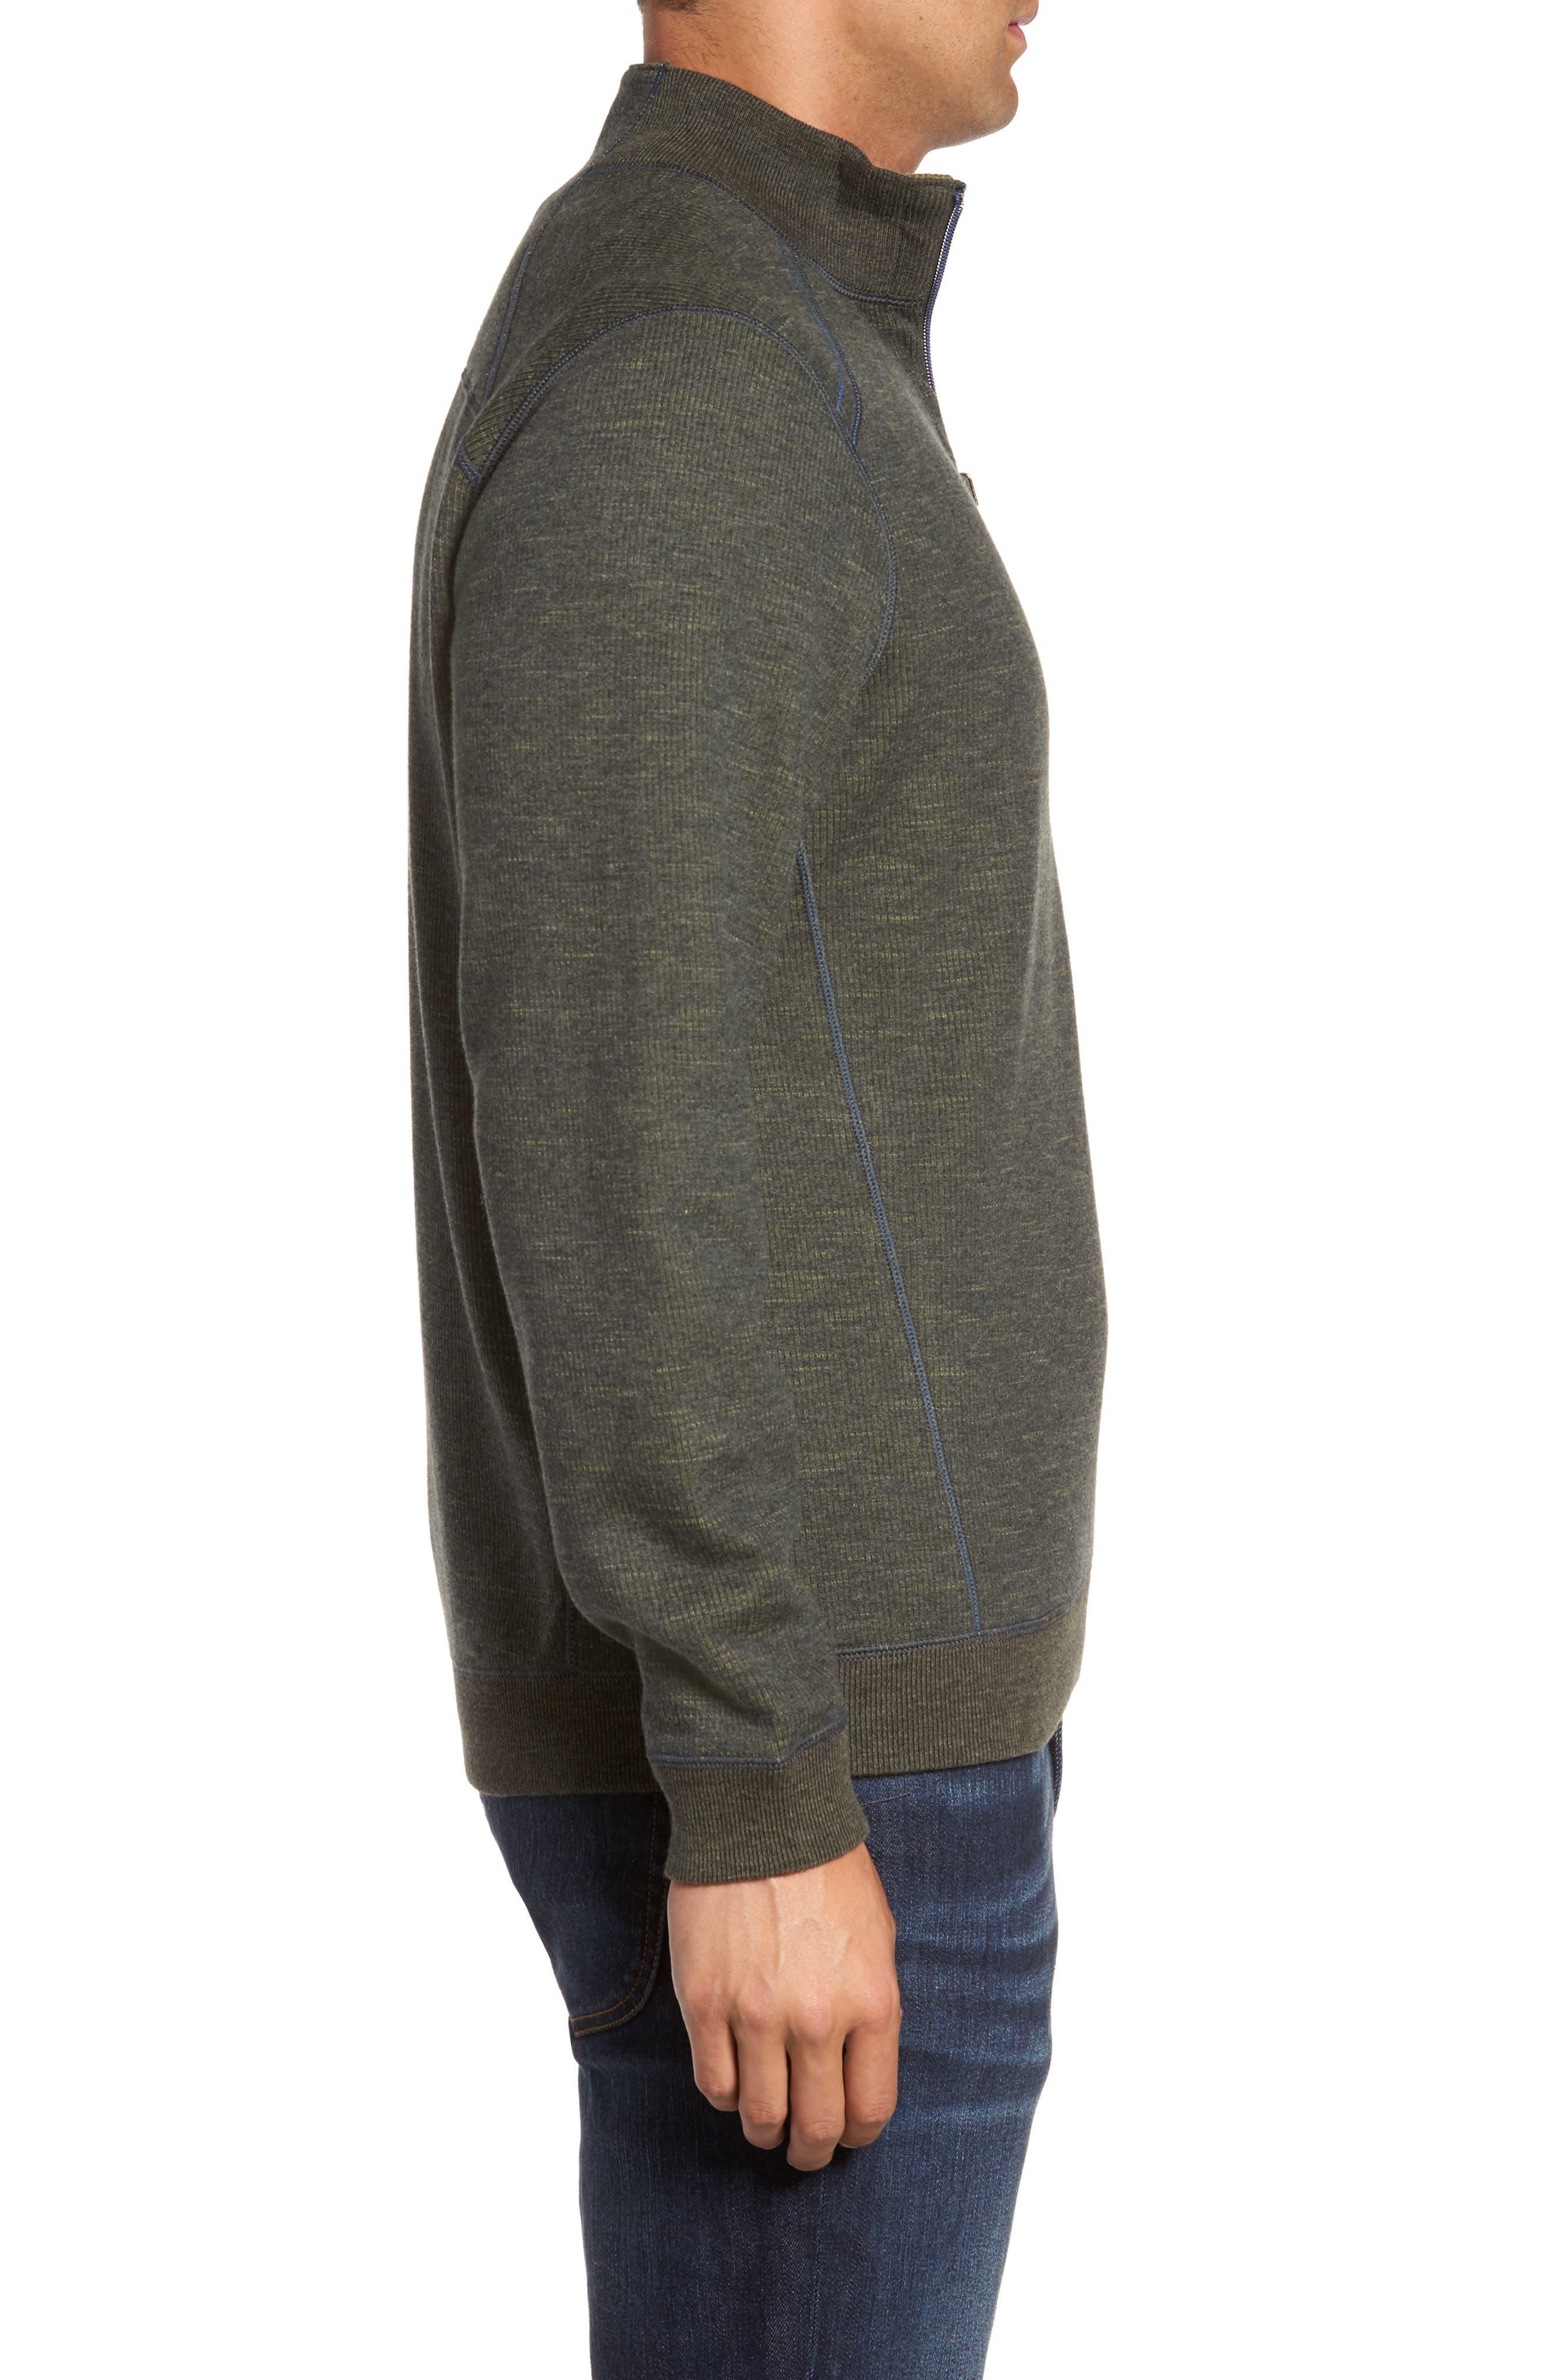 Flipsider Reversible Quarter-Zip Pullover,                             Alternate thumbnail 4, color,                             Steel Wool Heather